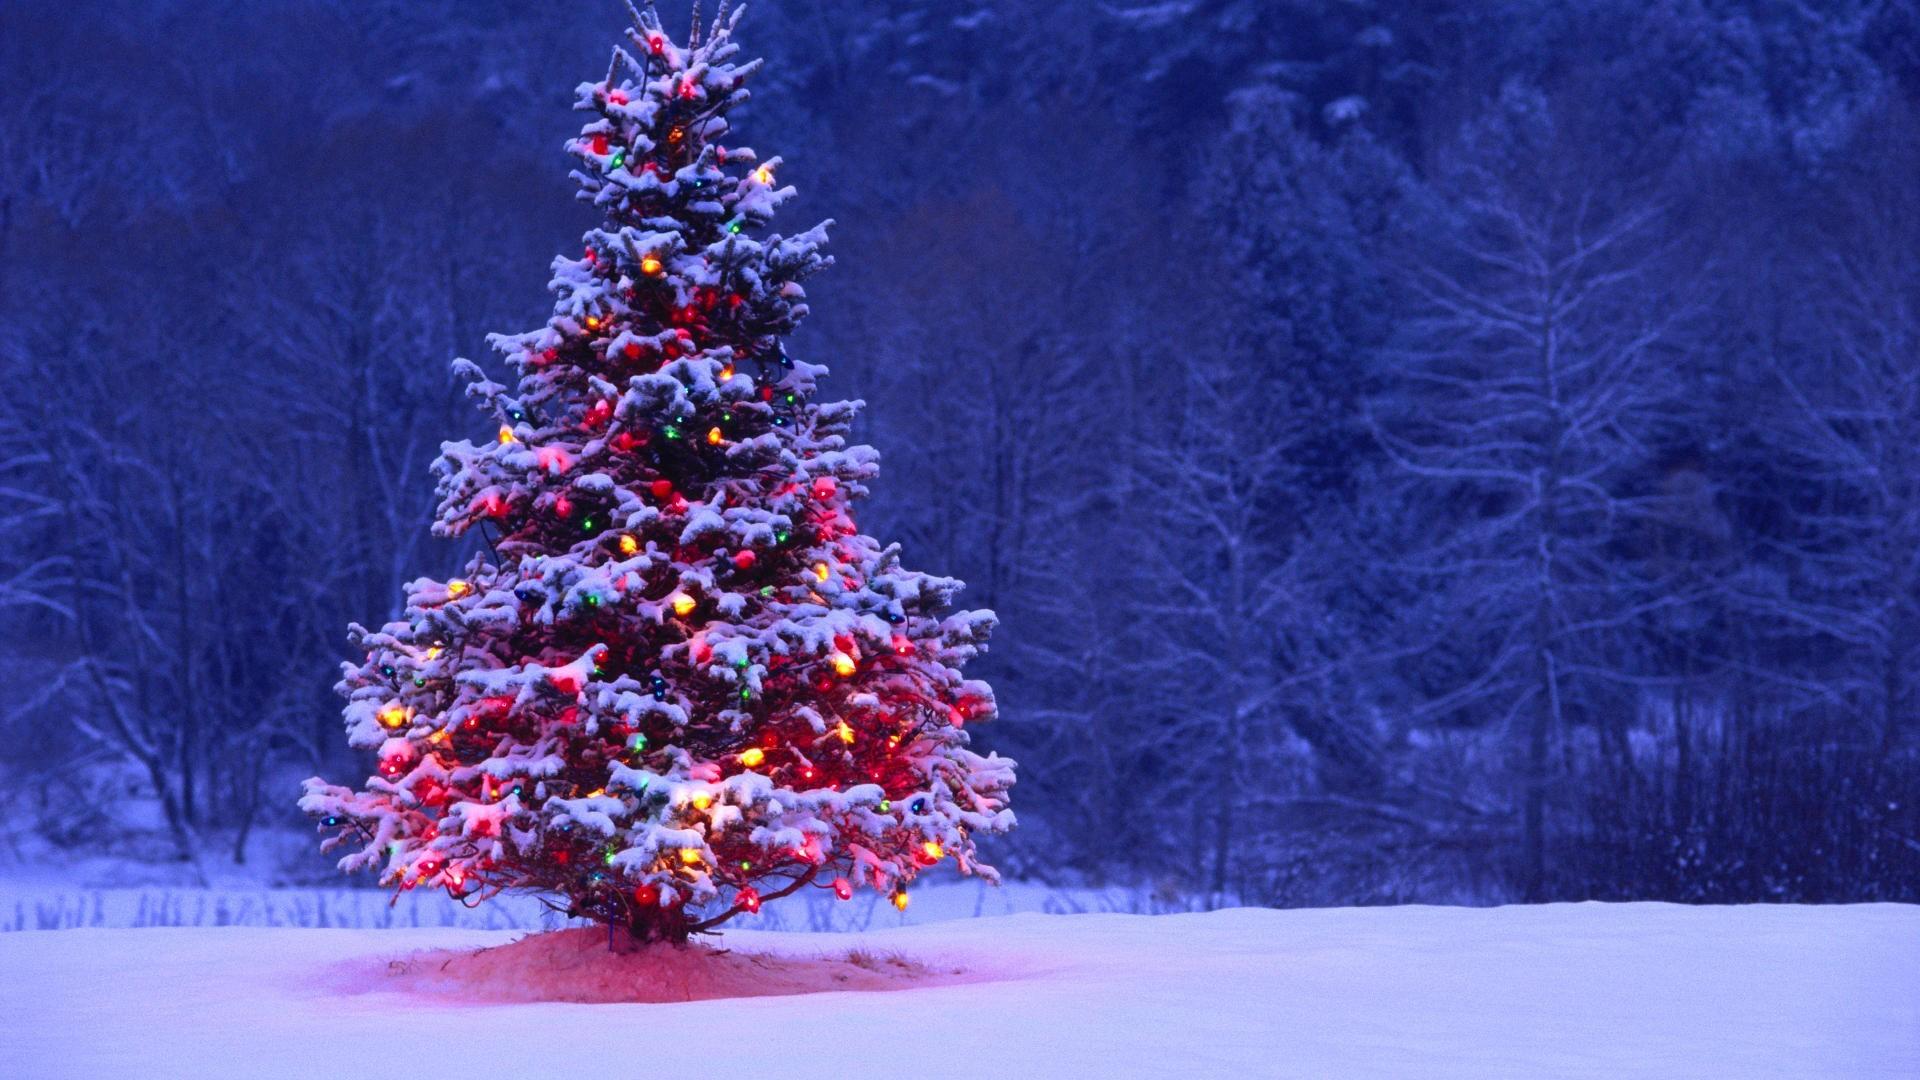 Christmas desktop wallpaper · You Don't Need Black Friday To Fulfill You  This Holiday Season